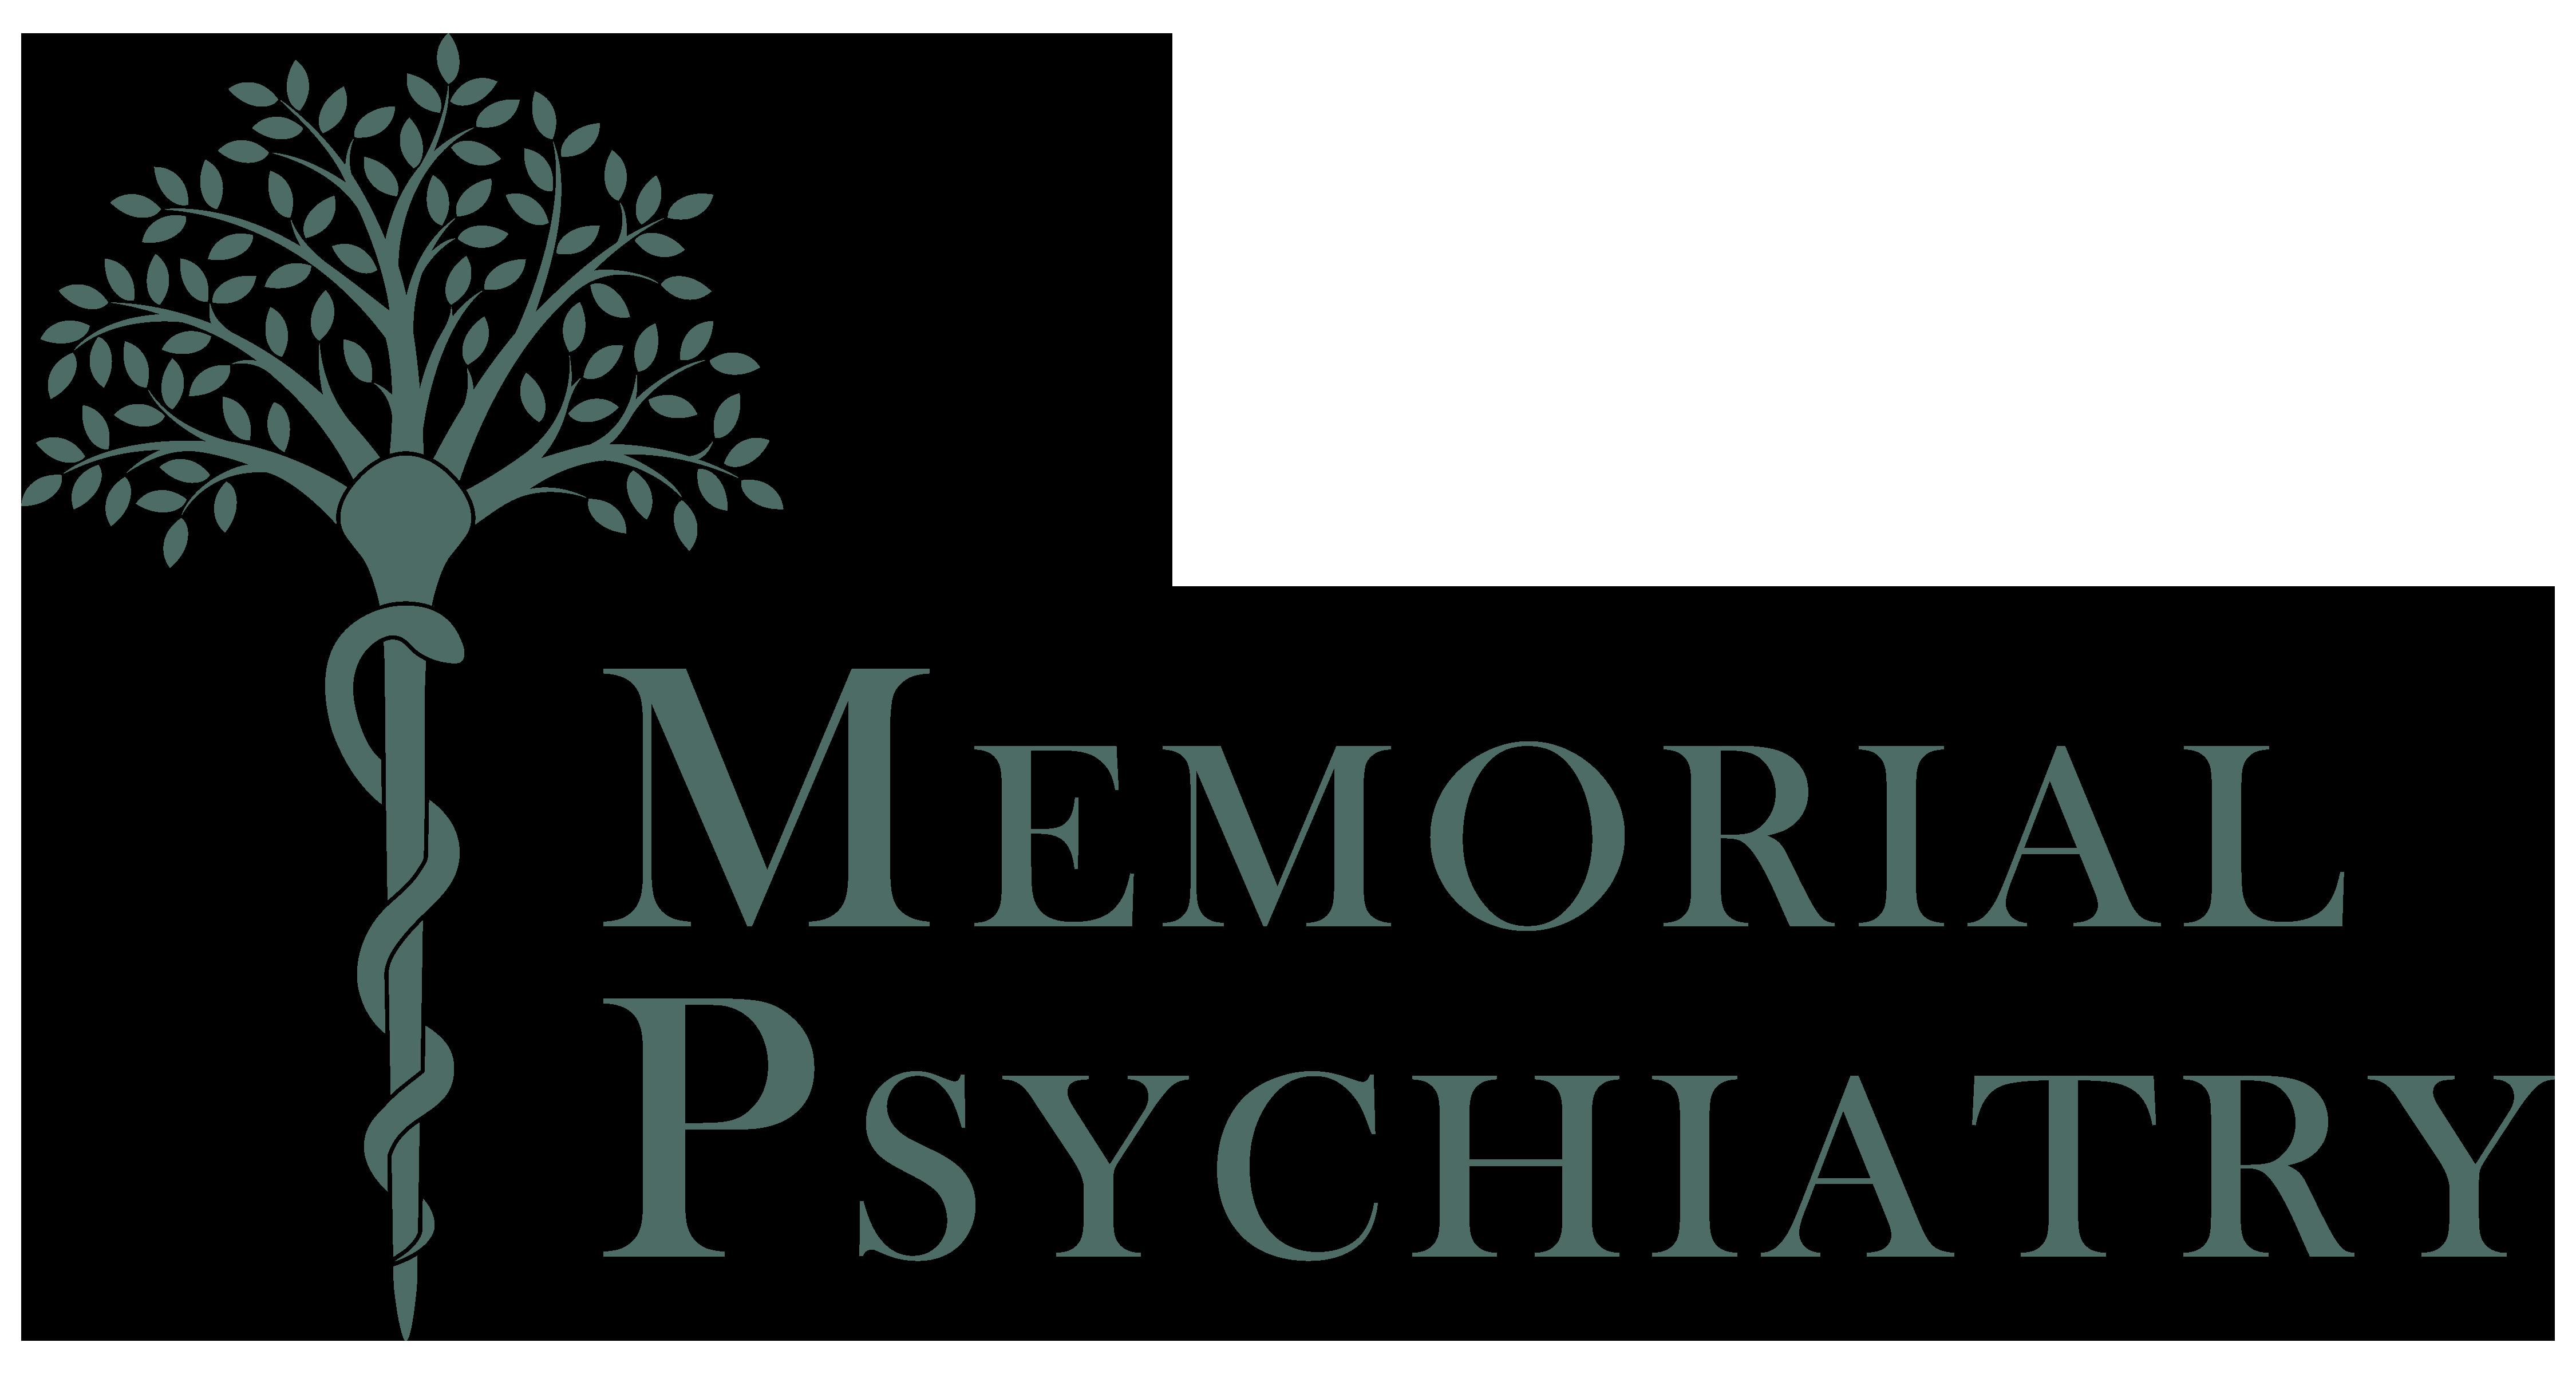 Memorial Psychiatry Logo - Board Certified Psychiatrists Houston